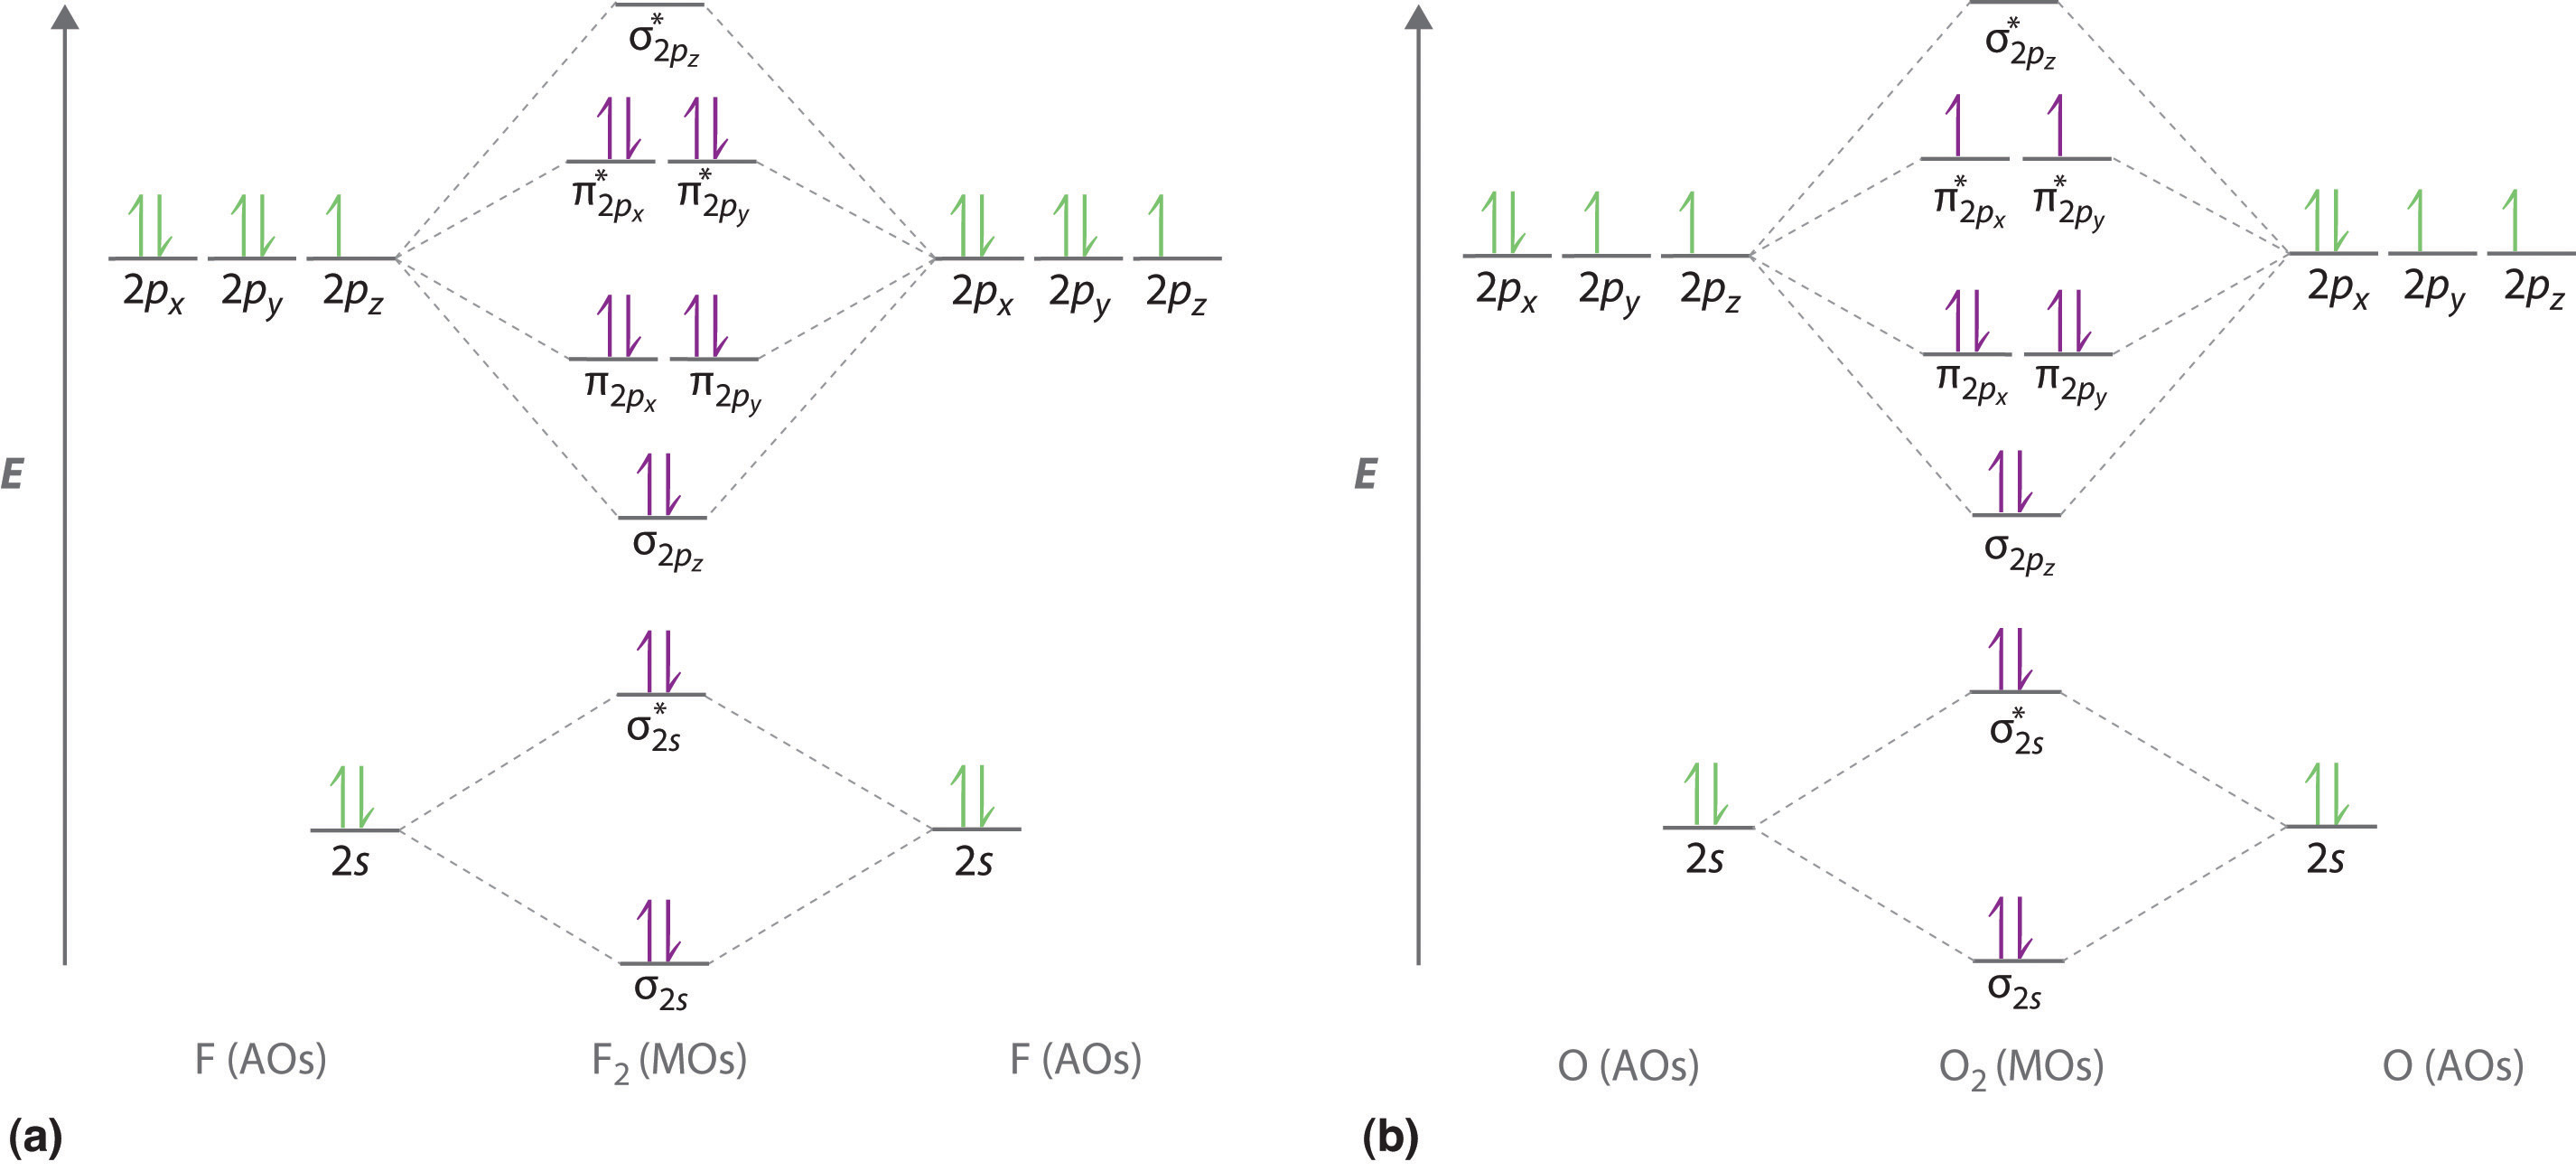 double bond electron dot diagram dimarzio hs3 wiring molecular geometry and covalent bonding models